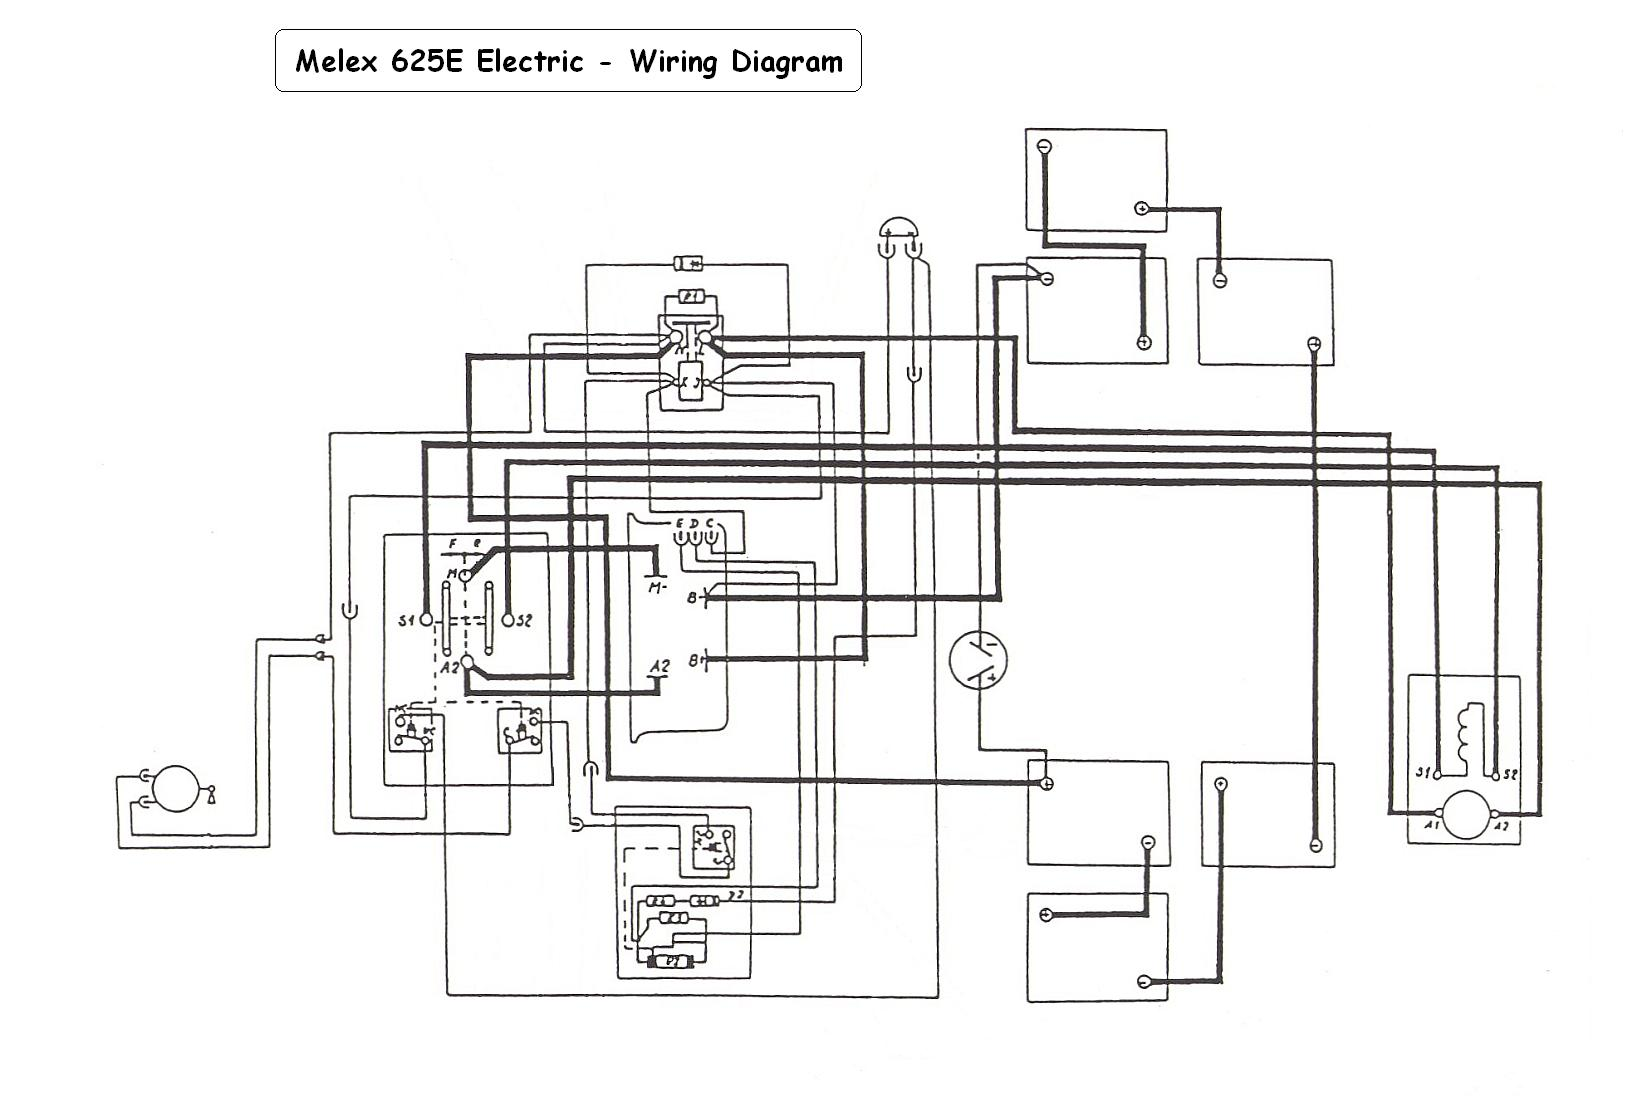 36 volt ezgo wiring diagram e 301   doubt-champion wiring diagram -  doubt-champion.ilcasaledelbarone.it  ilcasaledelbarone.it